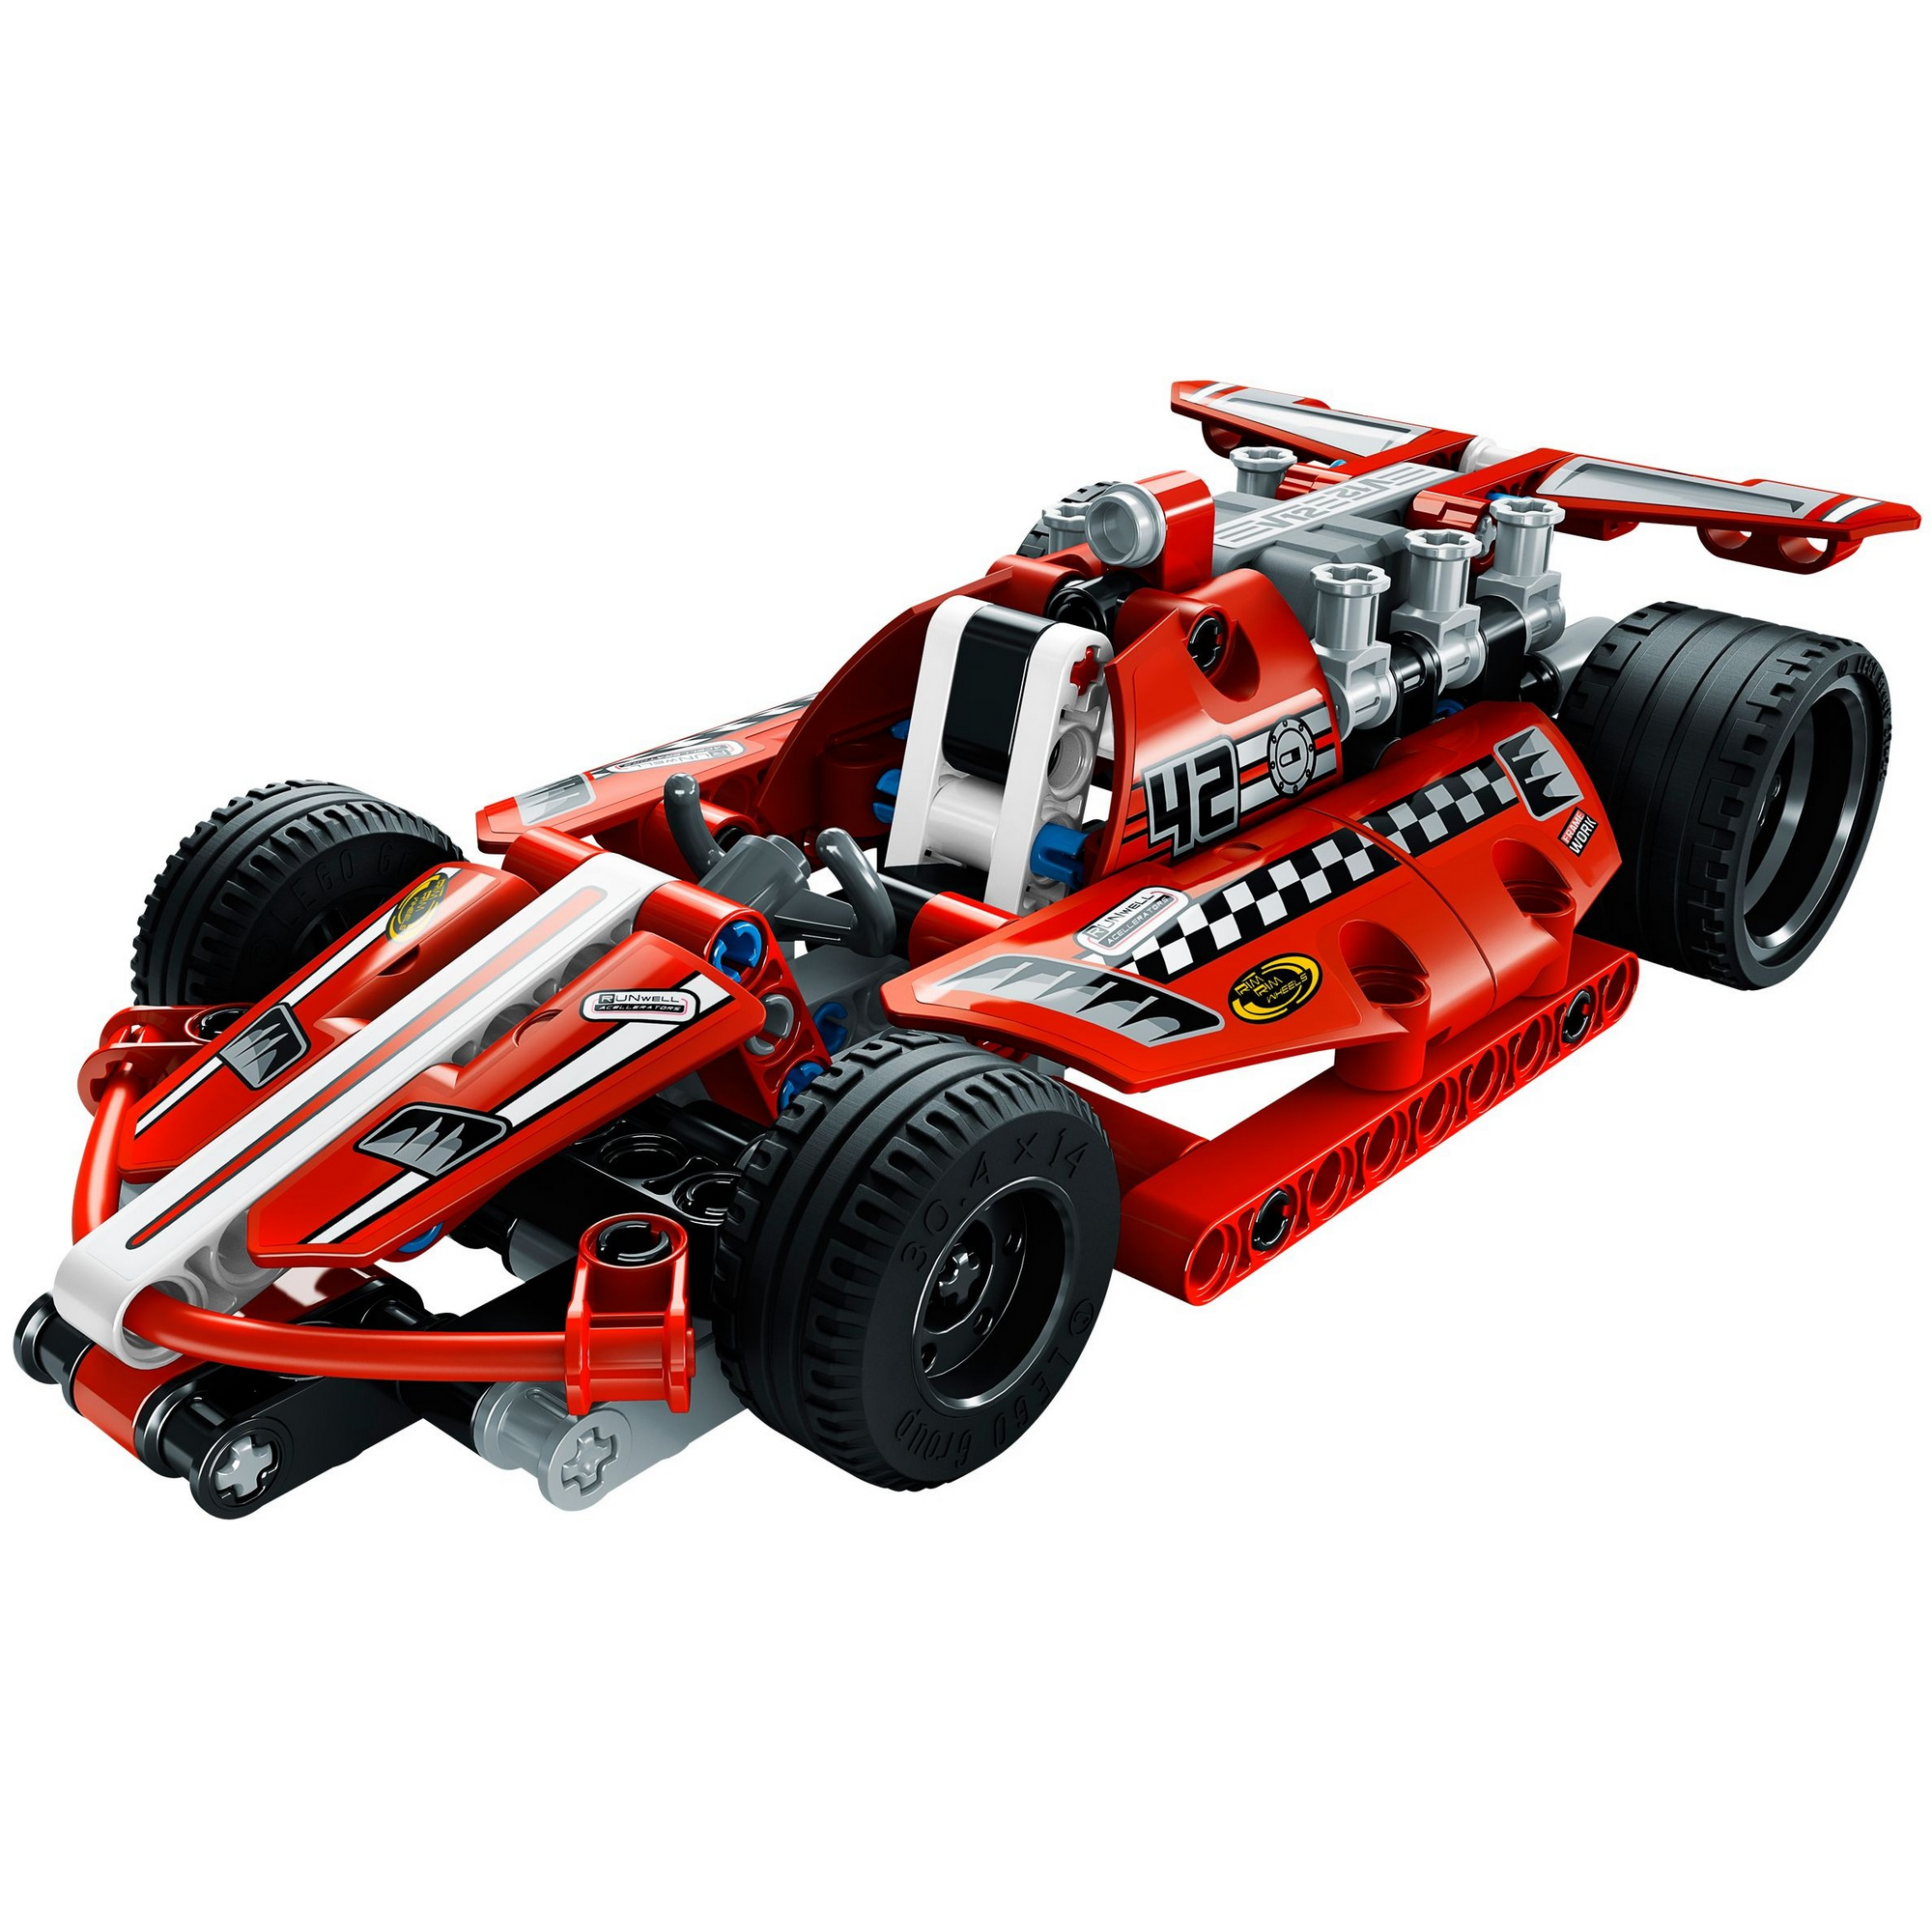 Buy Race car LEGO Technic (42011) on Robot Advance